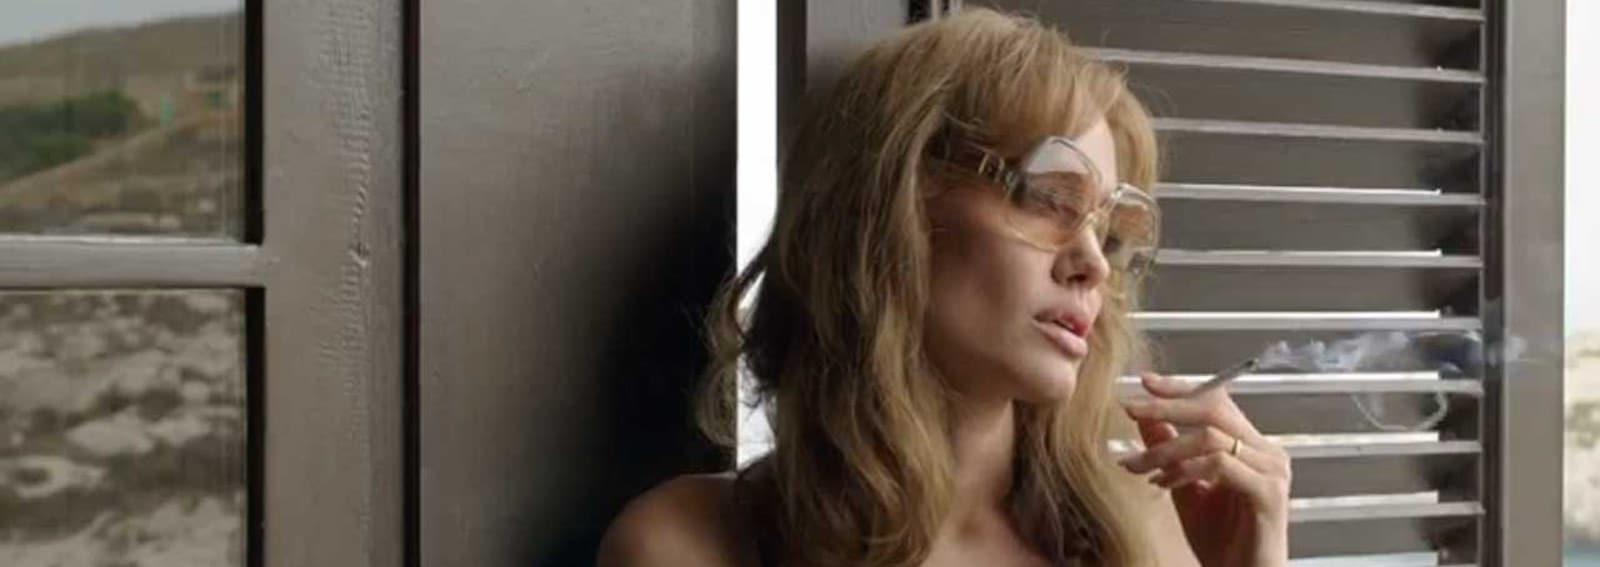 Angelina Jolie occhiali grandi